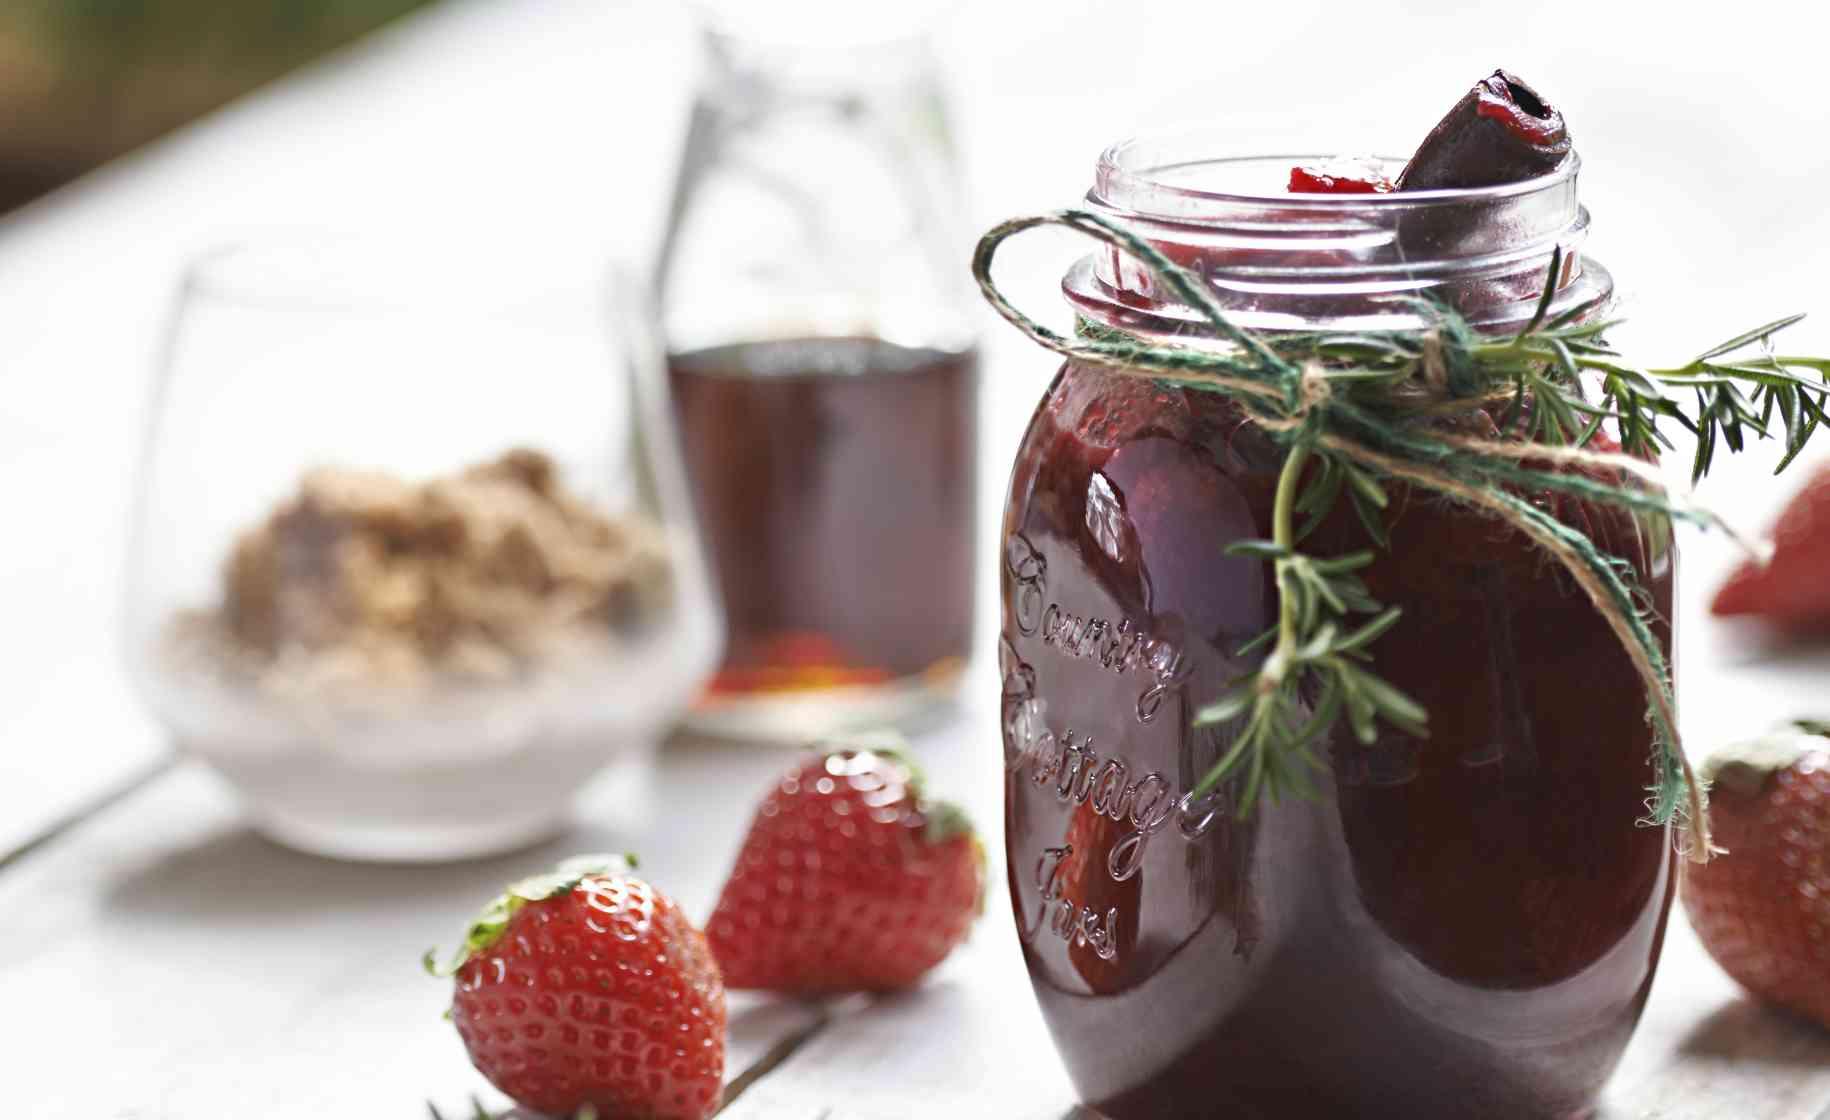 Strawberry beet jam